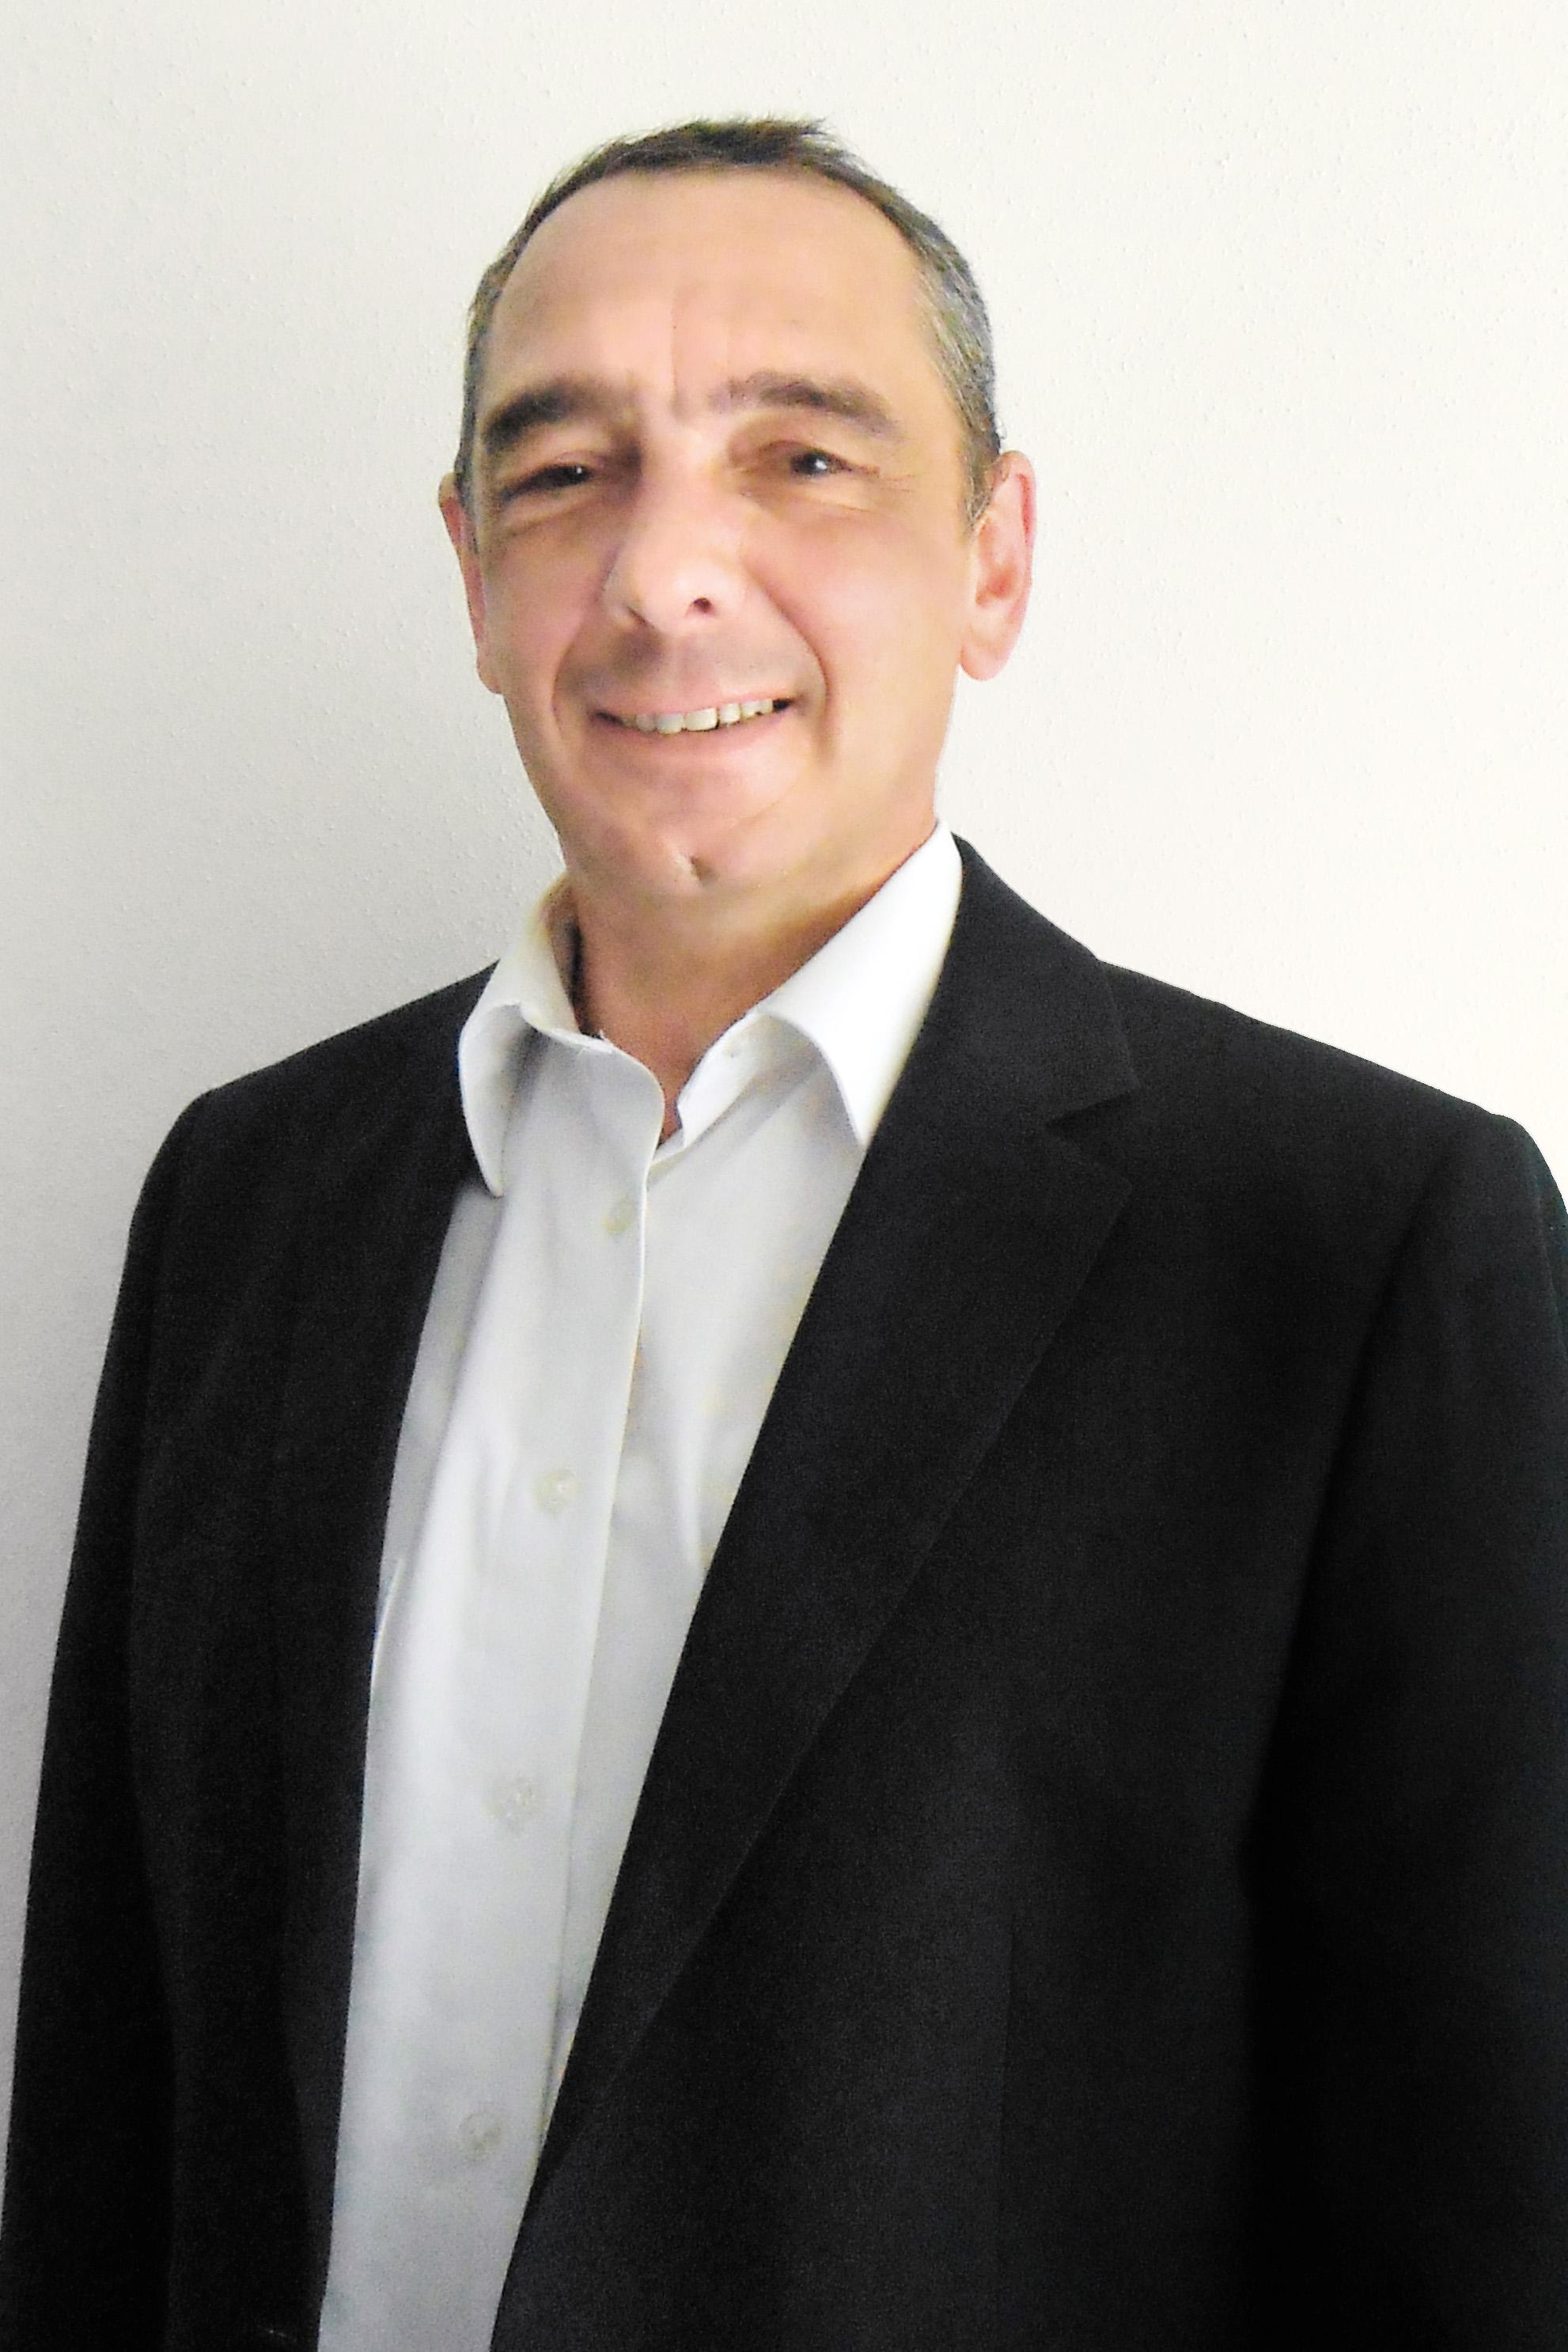 Jürgen Bradler